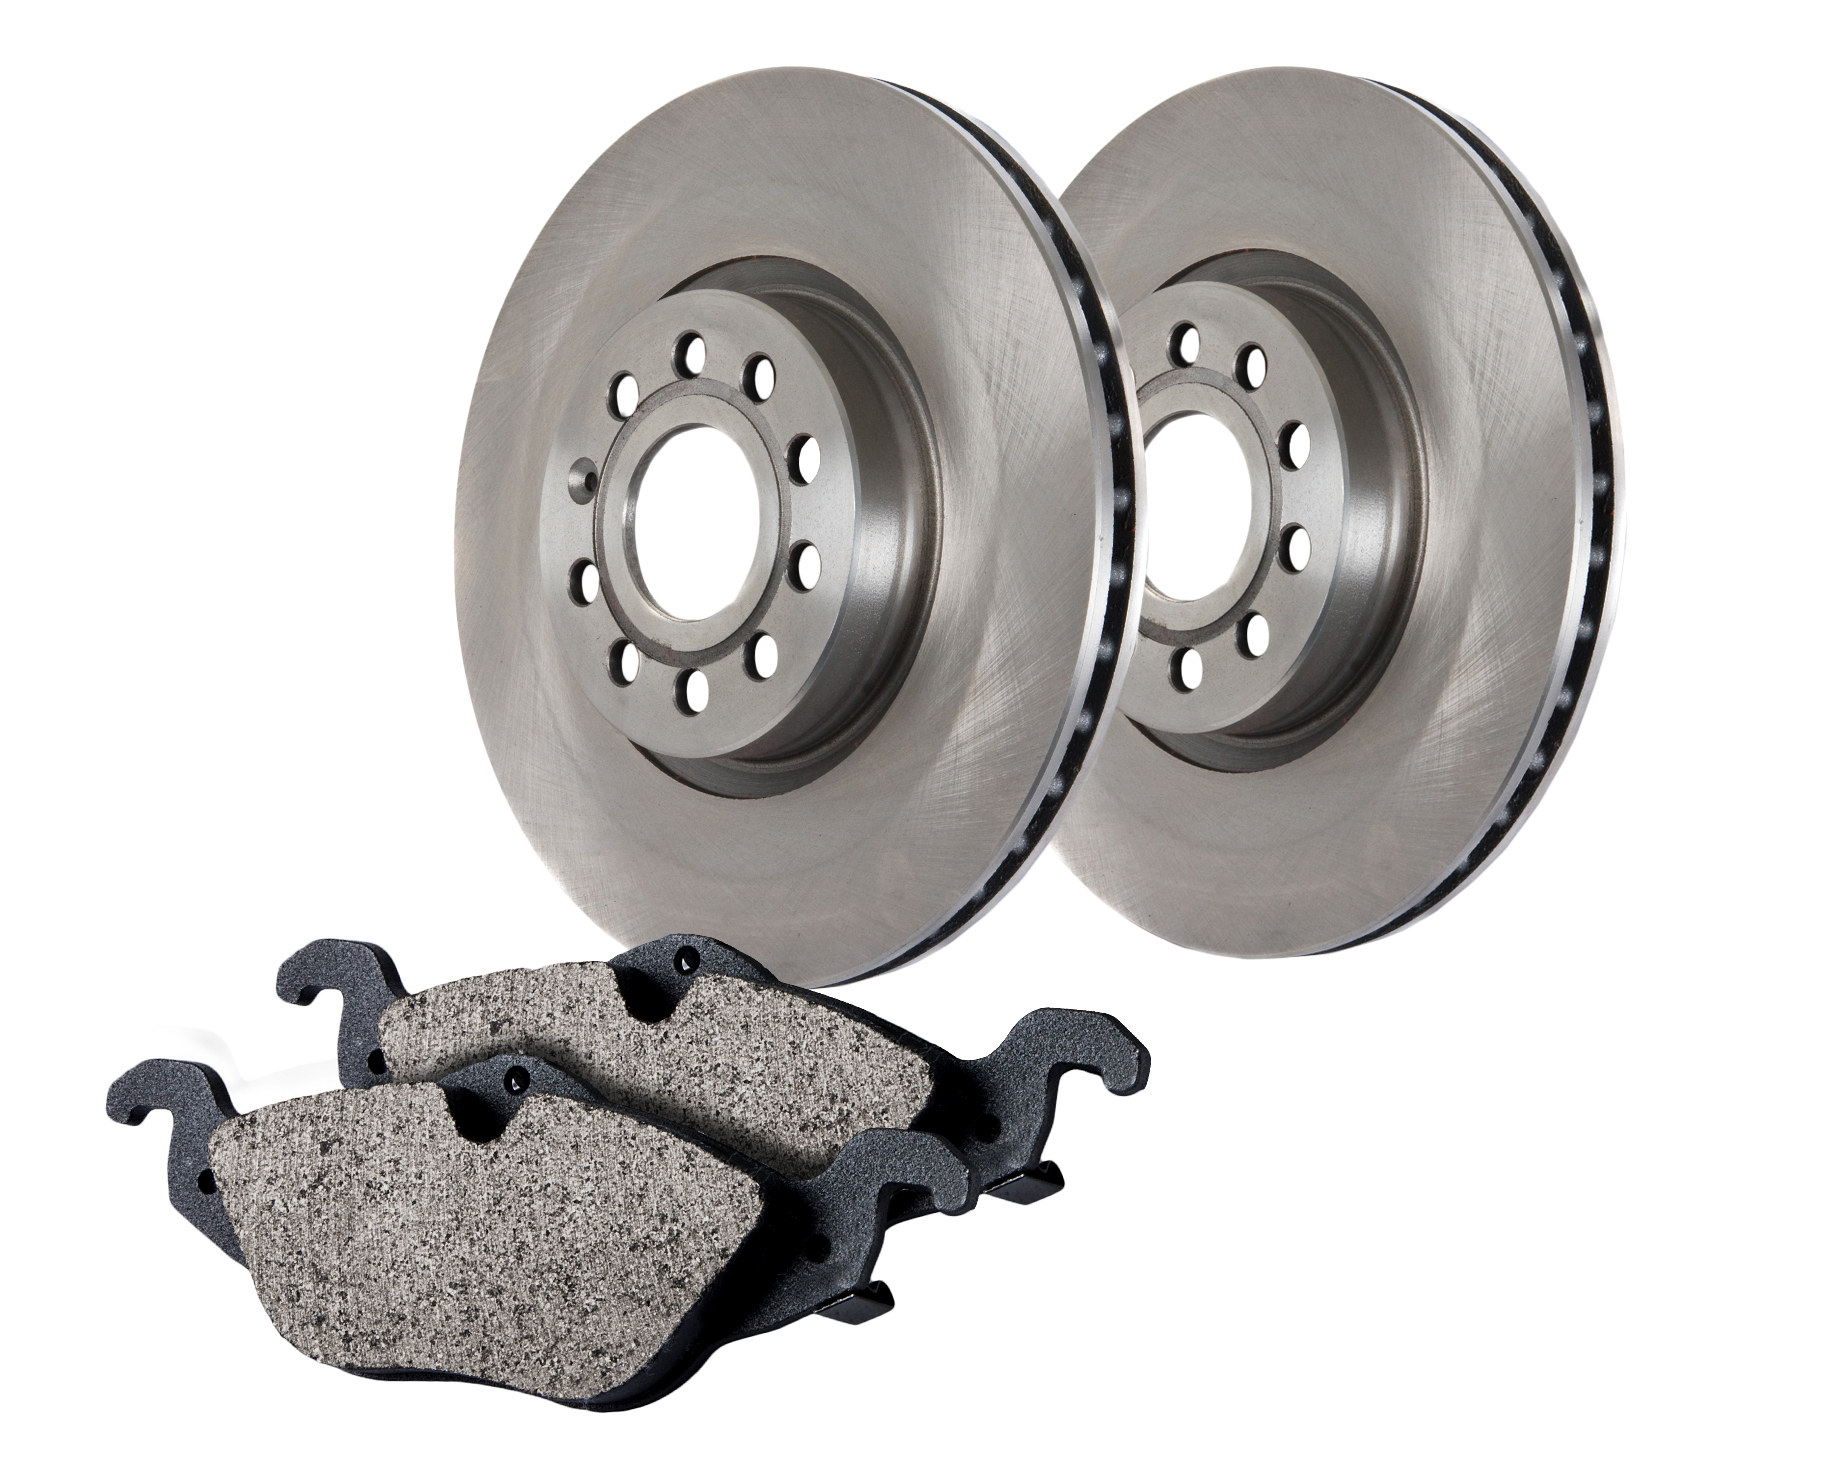 Centric Brake Parts 905.66013 Brake Rotor and Pad Kit, Premium, Semi-Metallic Pads, Iron, Natural, GM Fullsize Truck 2002-06, Kit